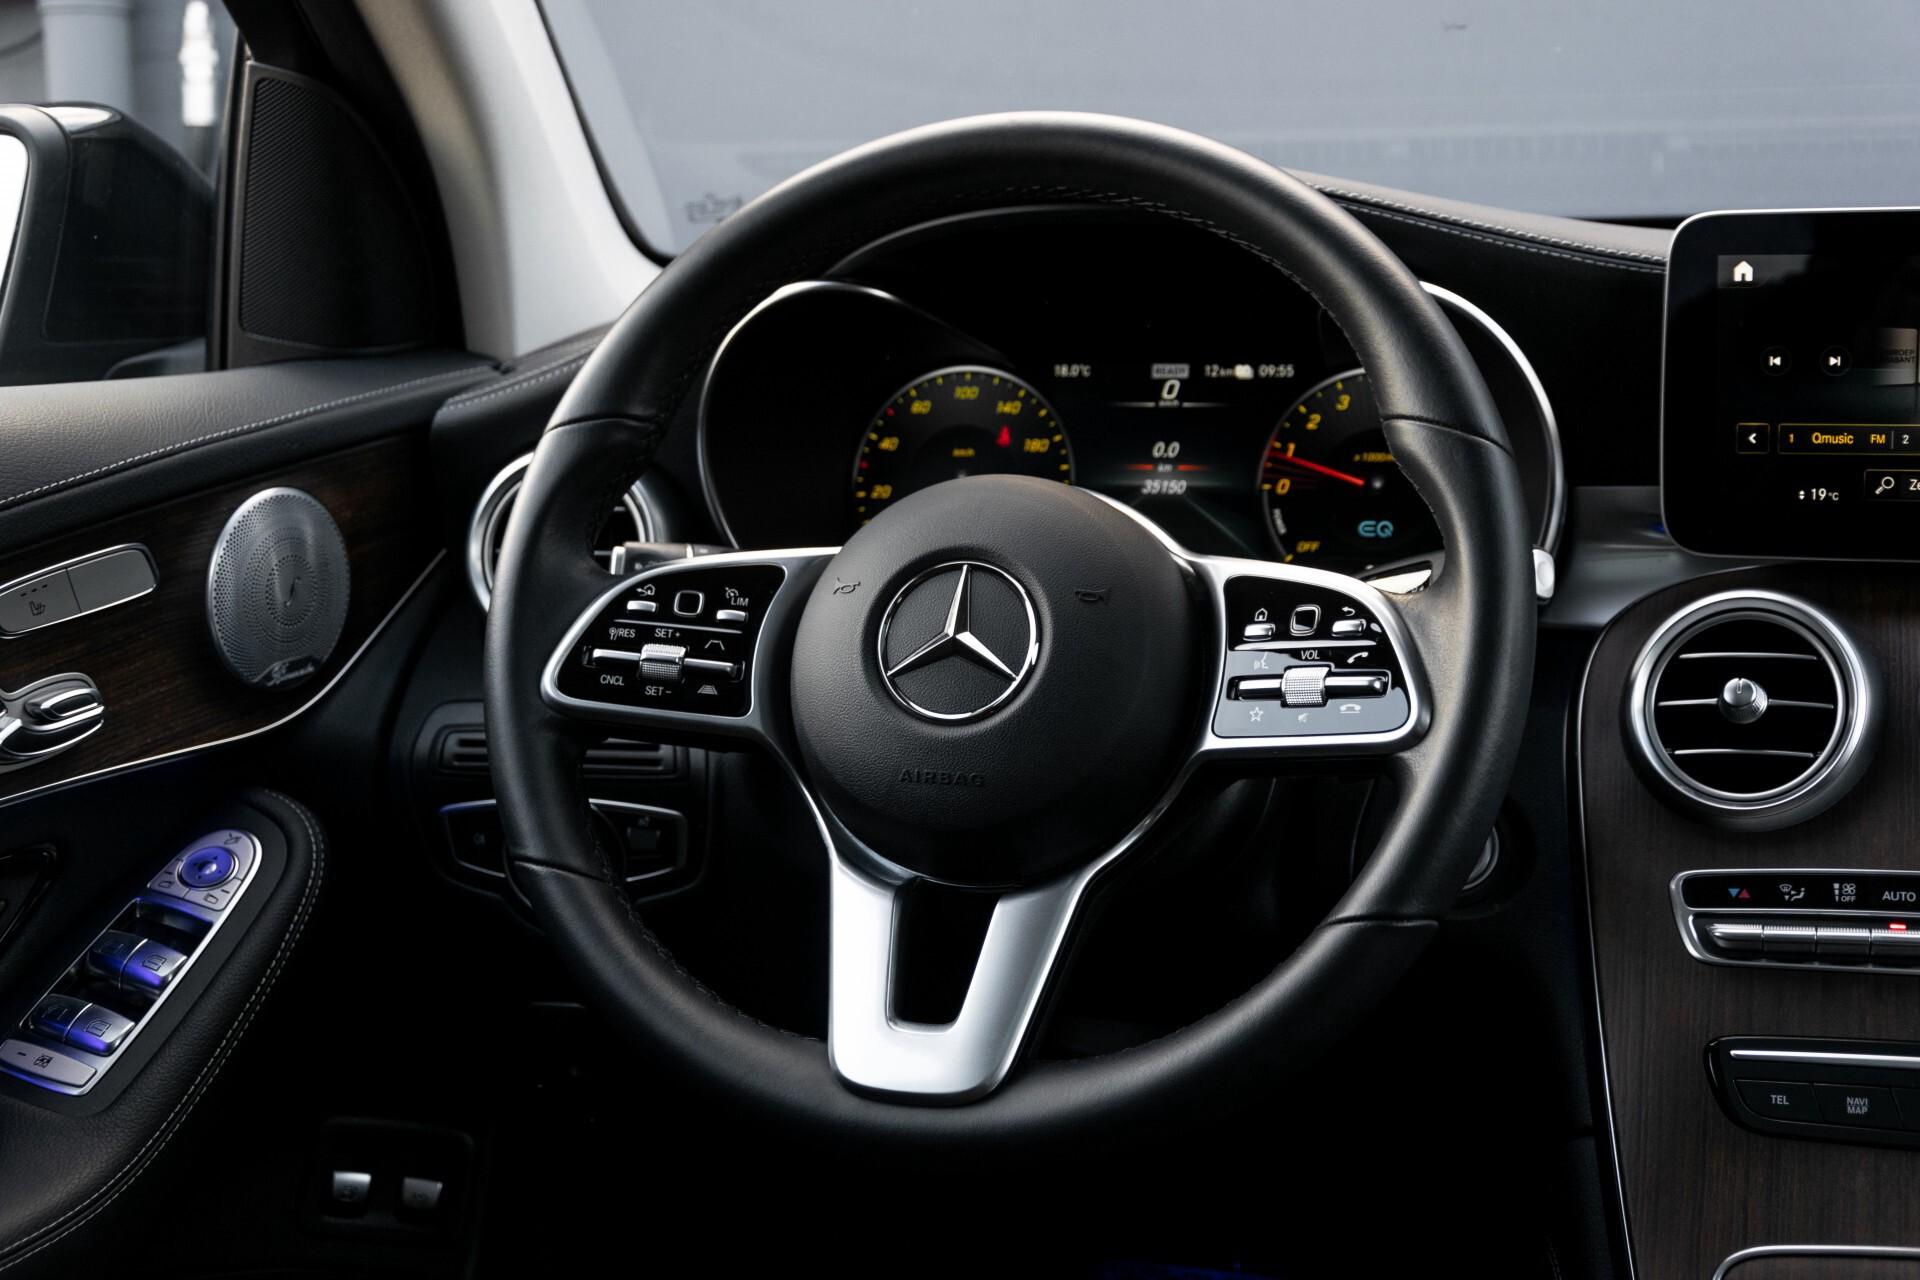 Mercedes-Benz GLC 300e 4-M Luchtvering/Panorama/Multicontourstoelen/Rij-assistentie/Standkachel Aut9 Foto 8